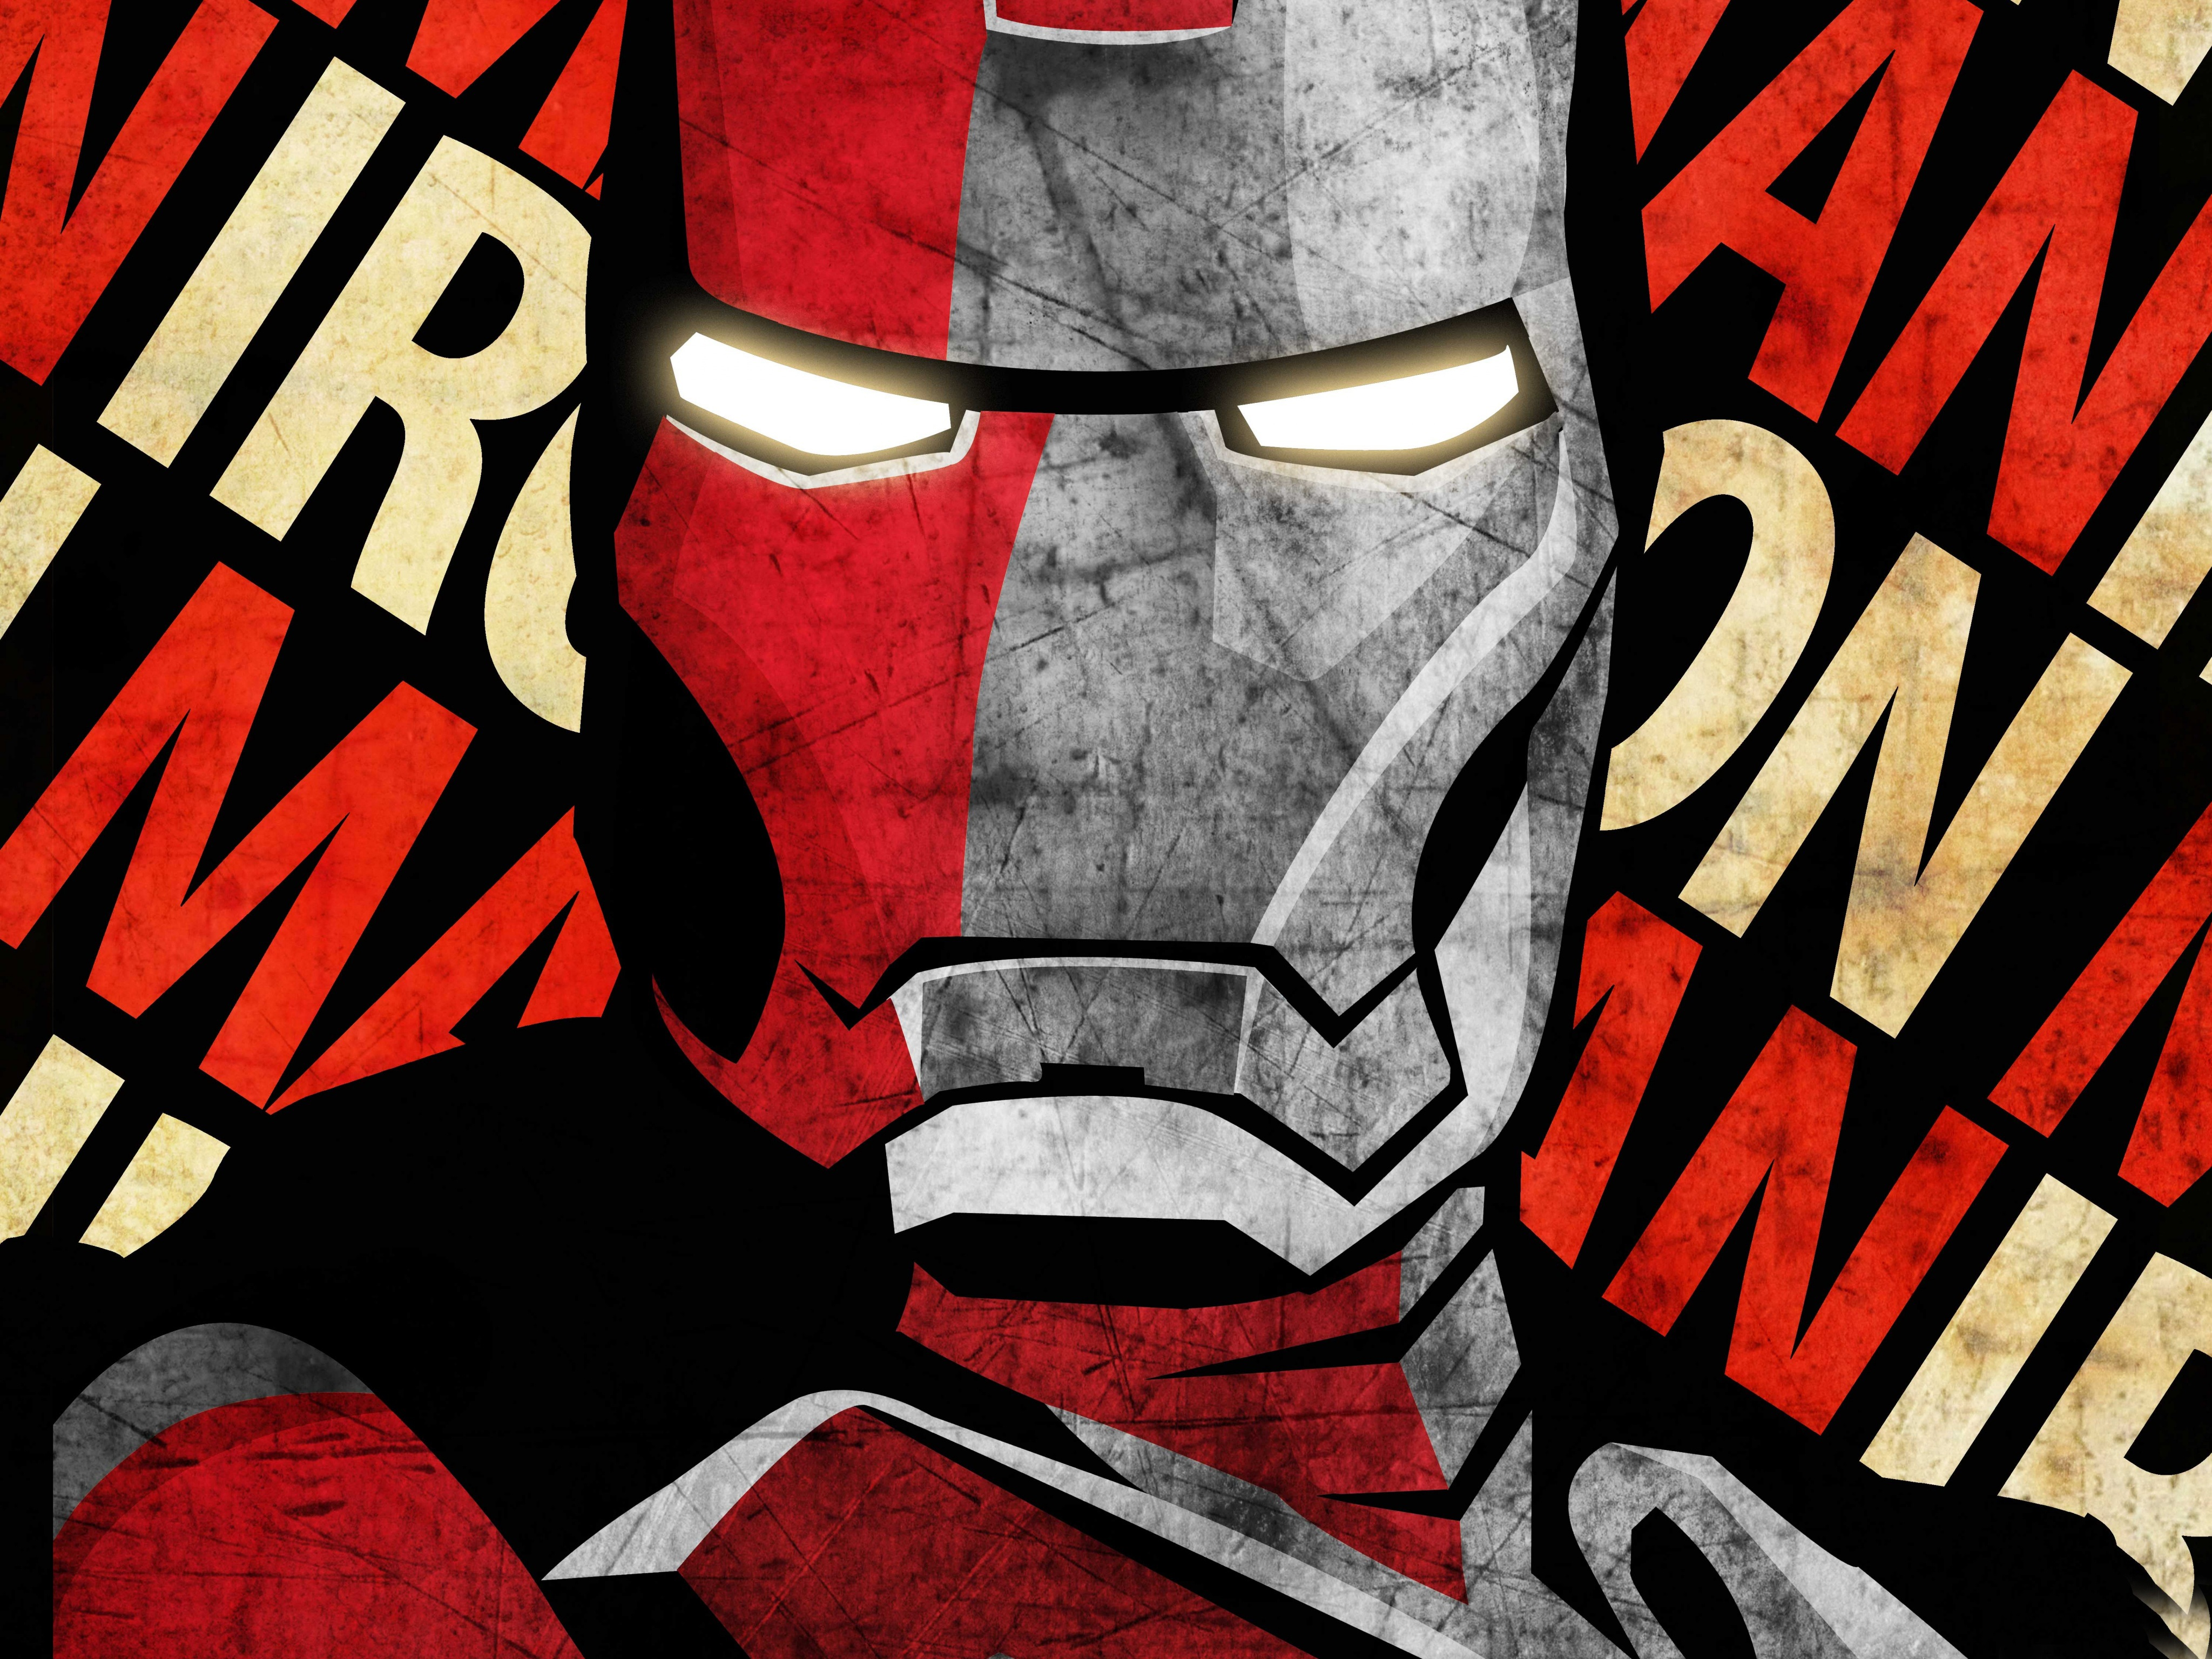 Iron Man 3 wallpaper 16